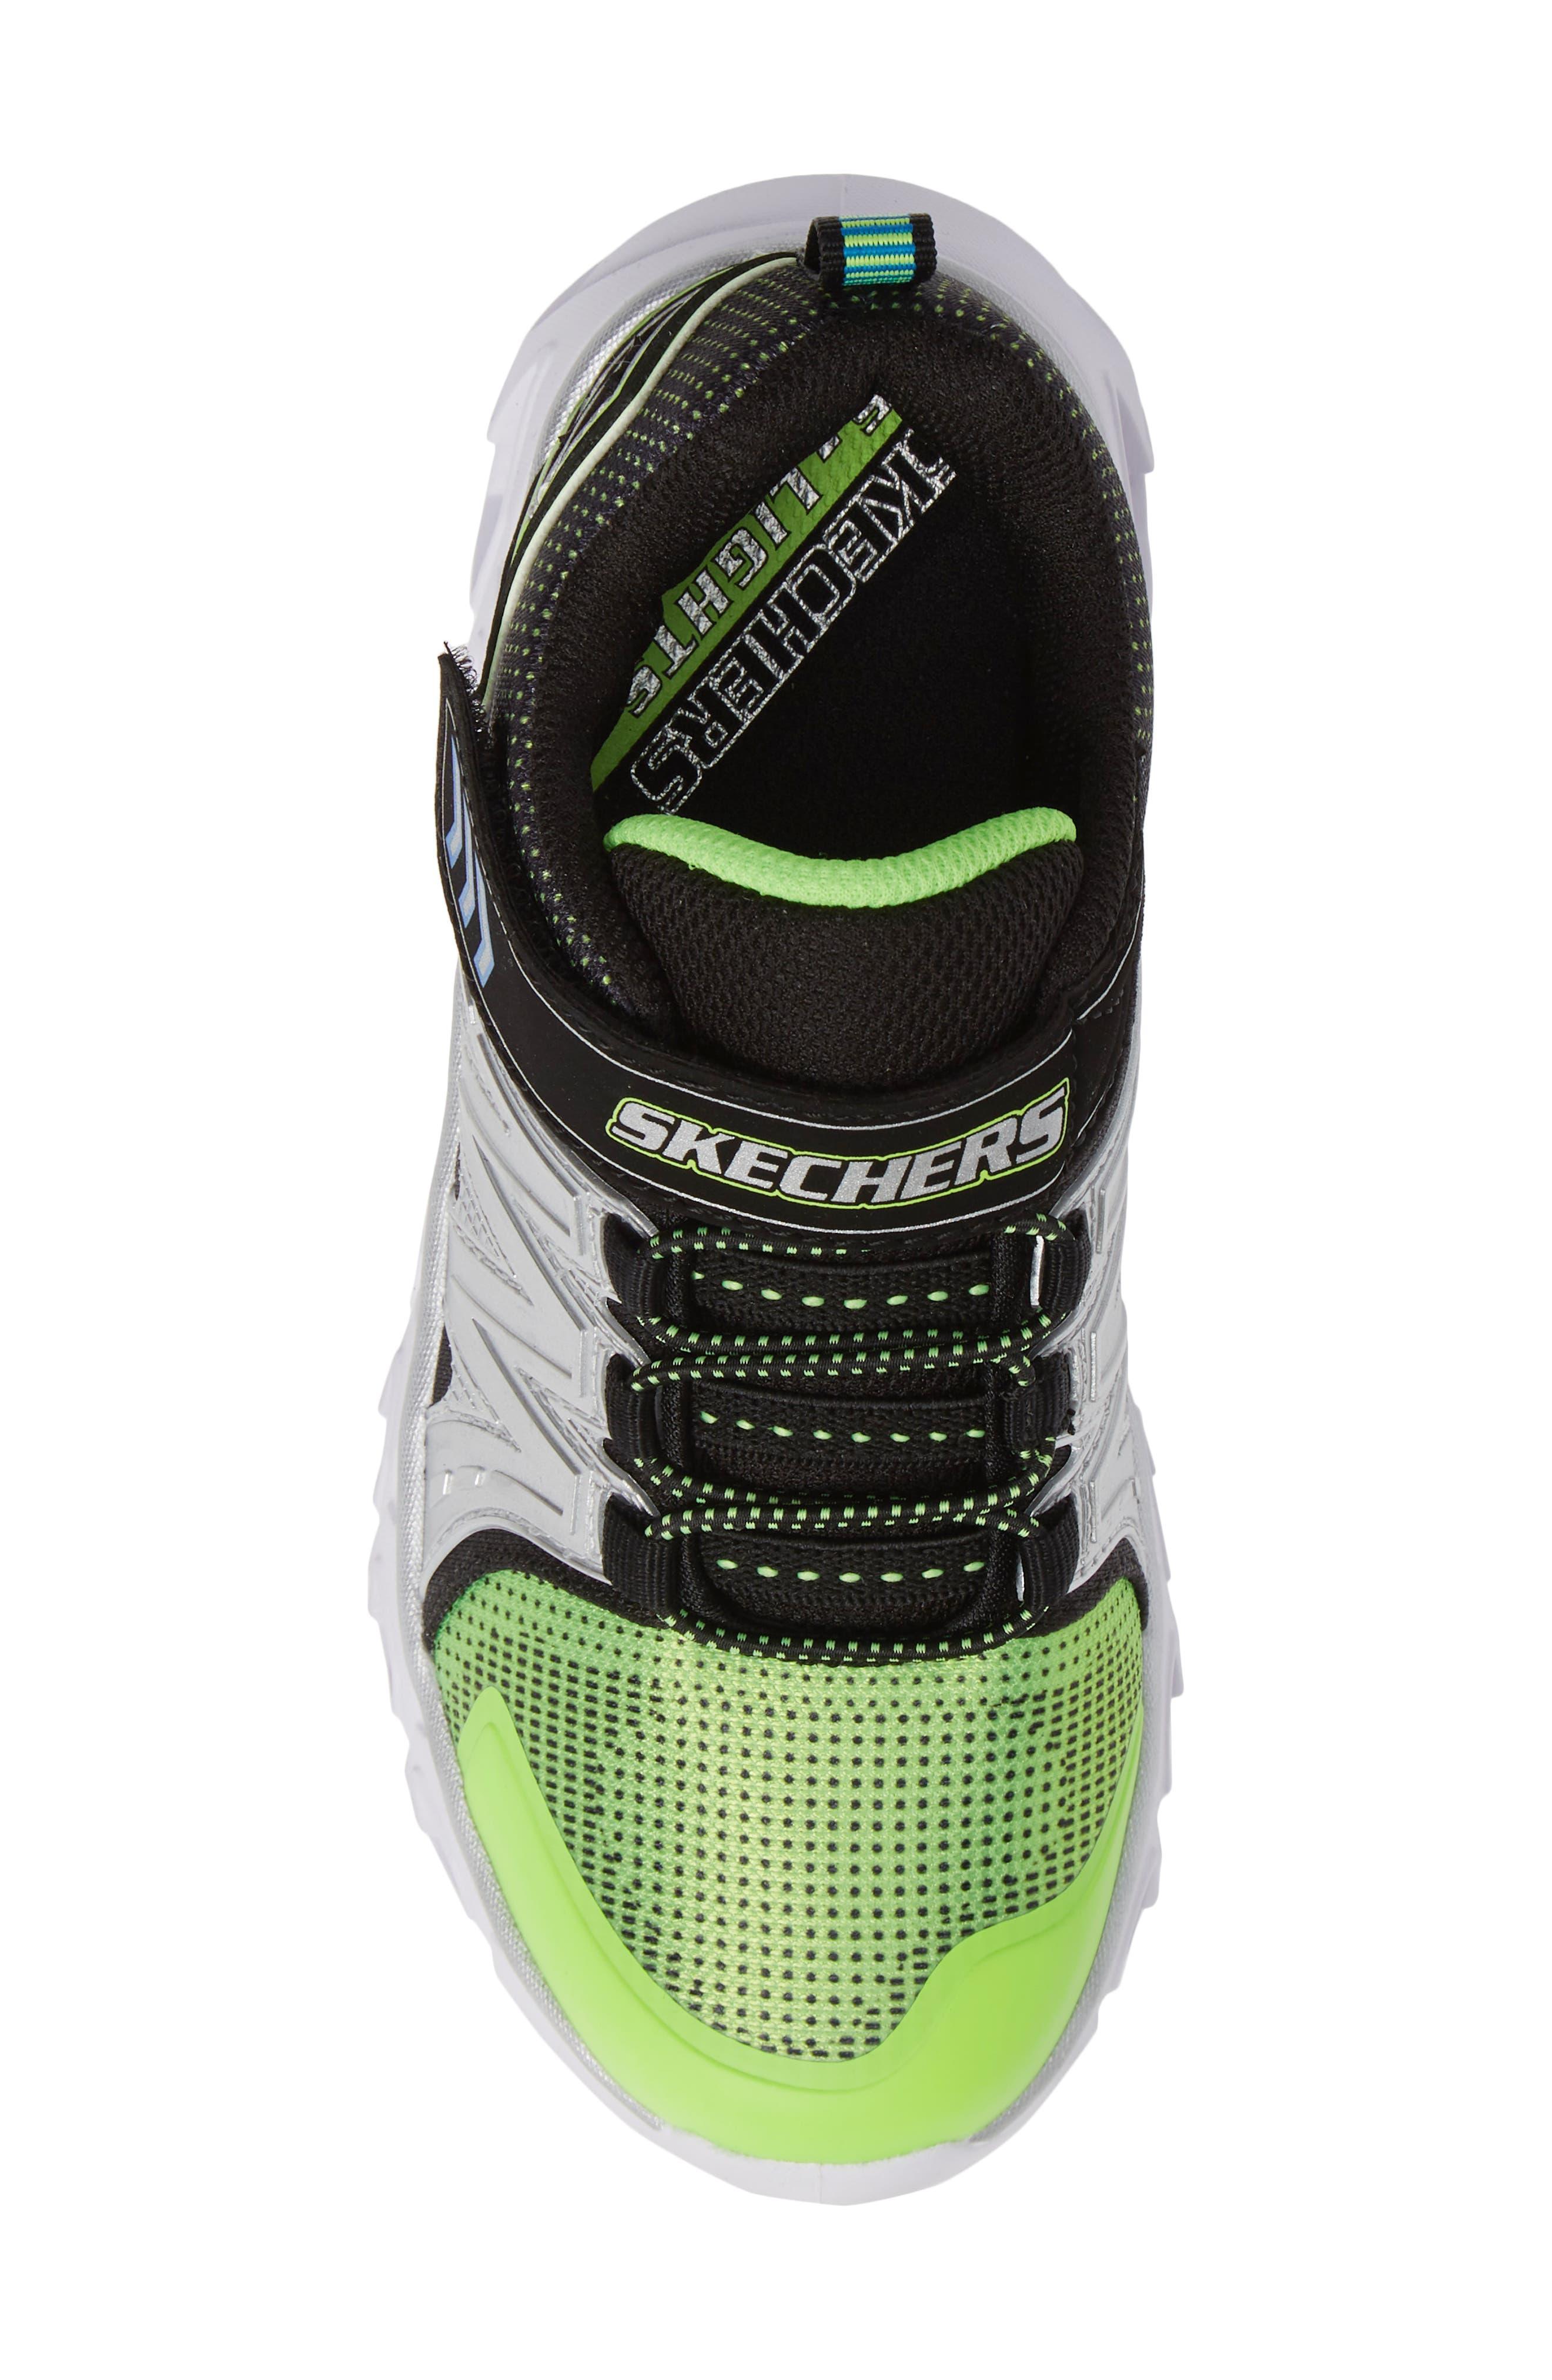 Hypno-Flash 2.0 Sneakers,                             Alternate thumbnail 5, color,                             Lime/ Black